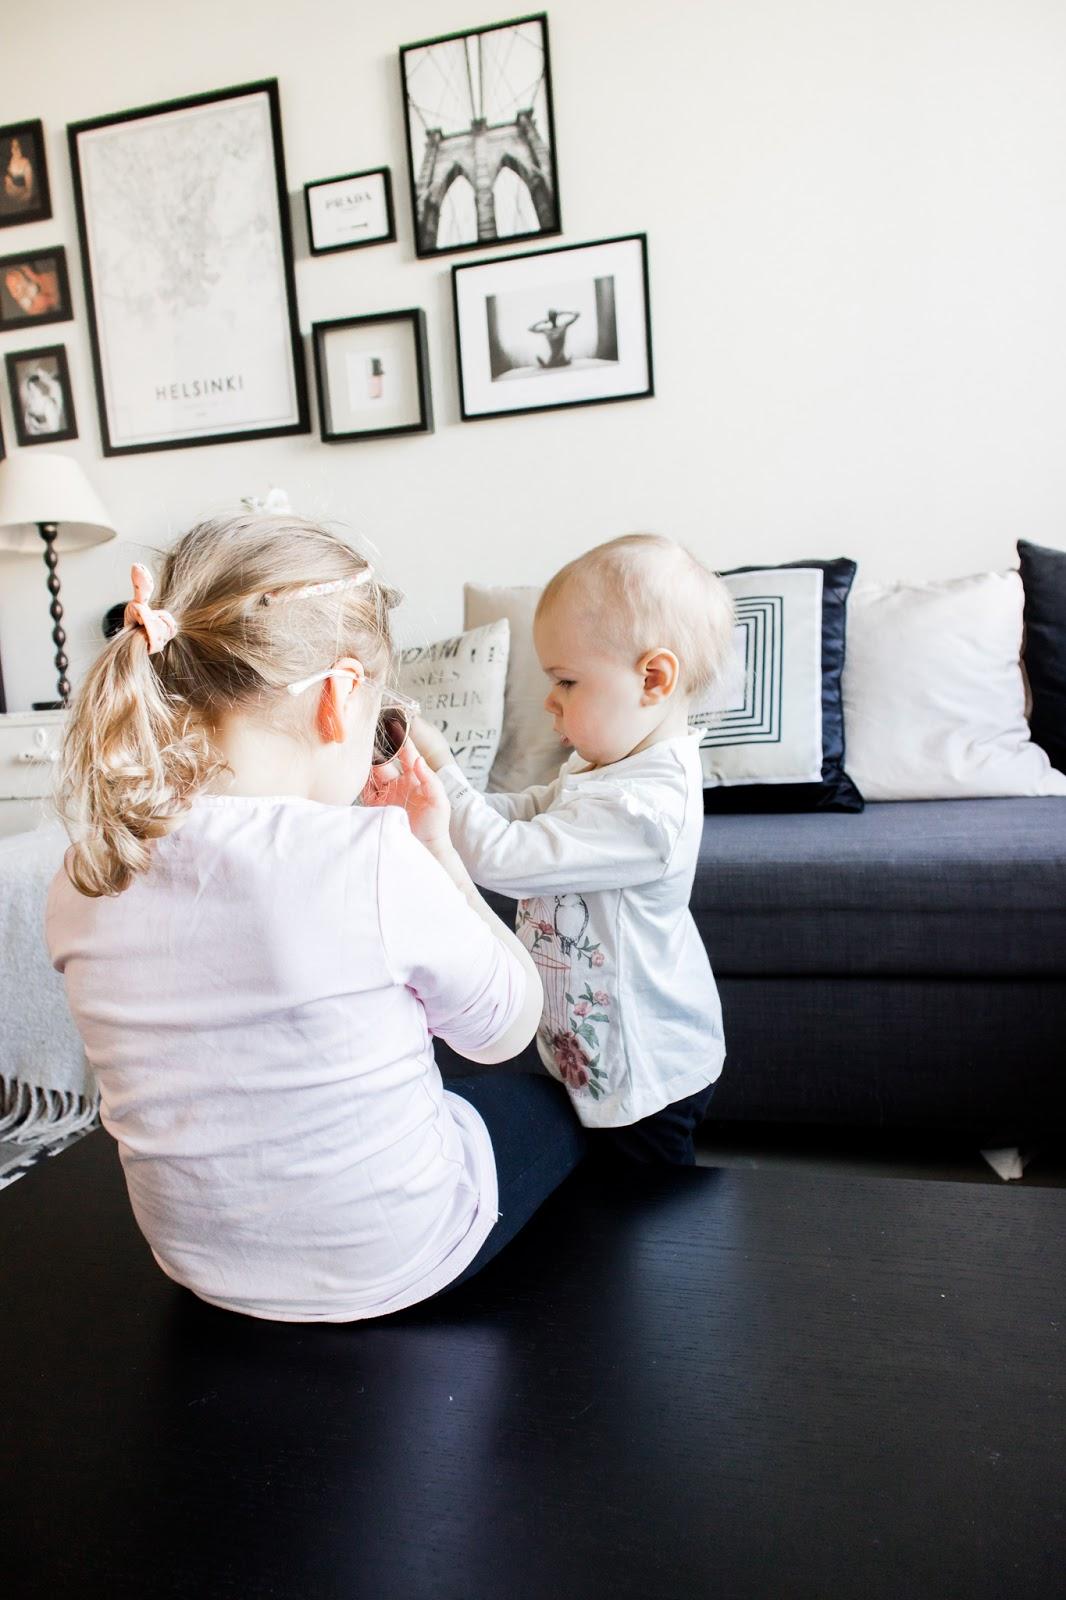 Little E, fysioterapia, fyssari, lapsen fysioterapia, 3-vuotias, kolmevuotias,